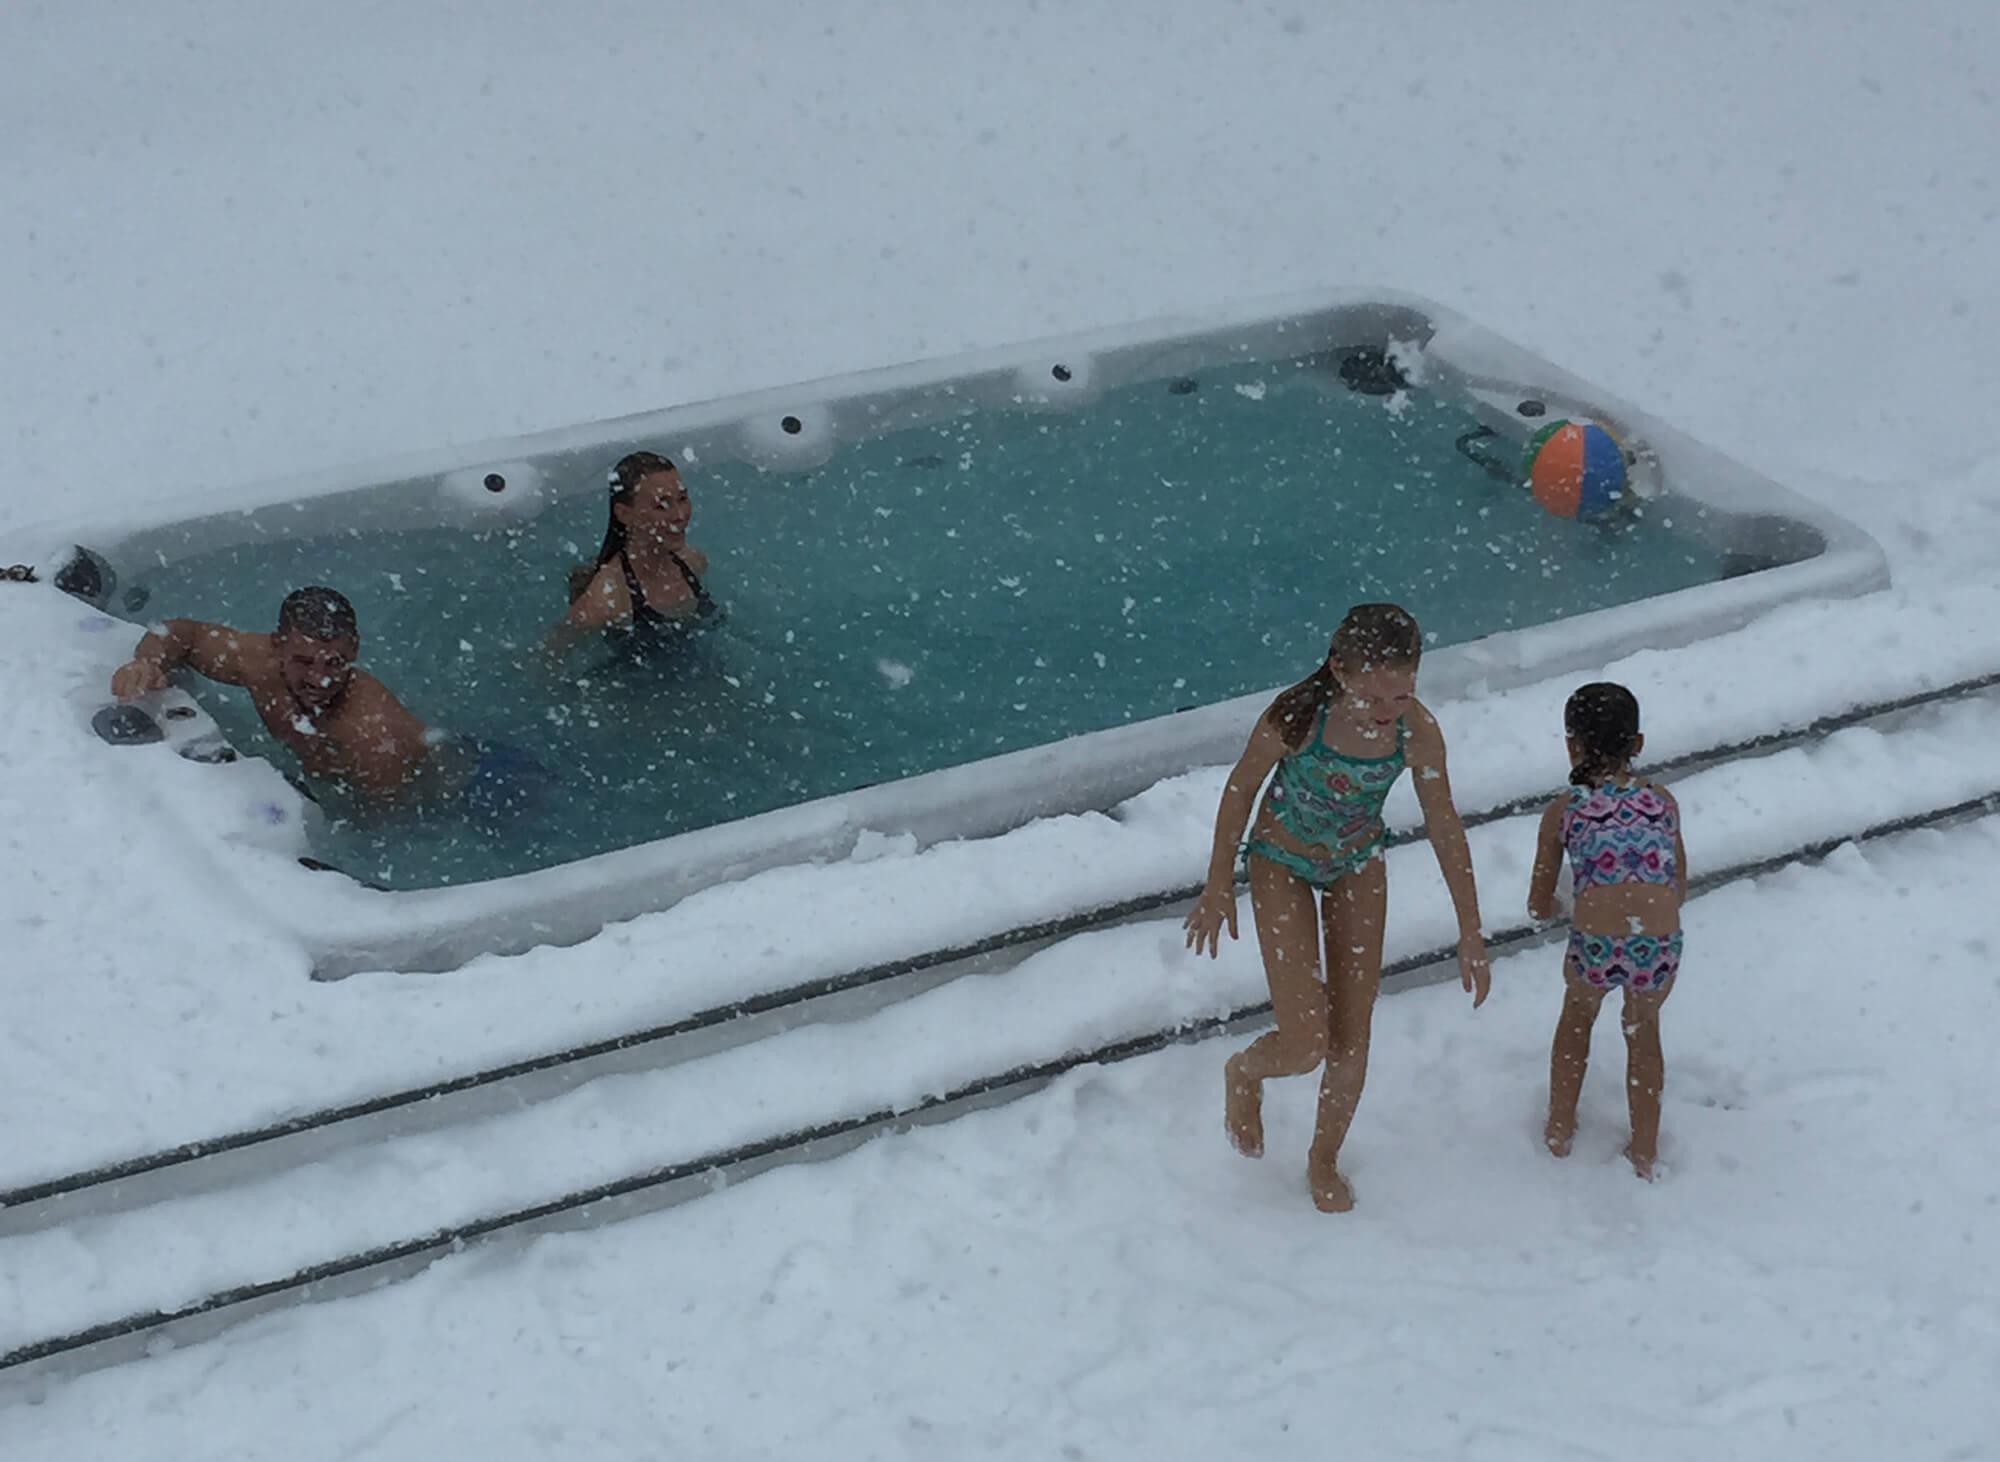 Whirlpool im Winter